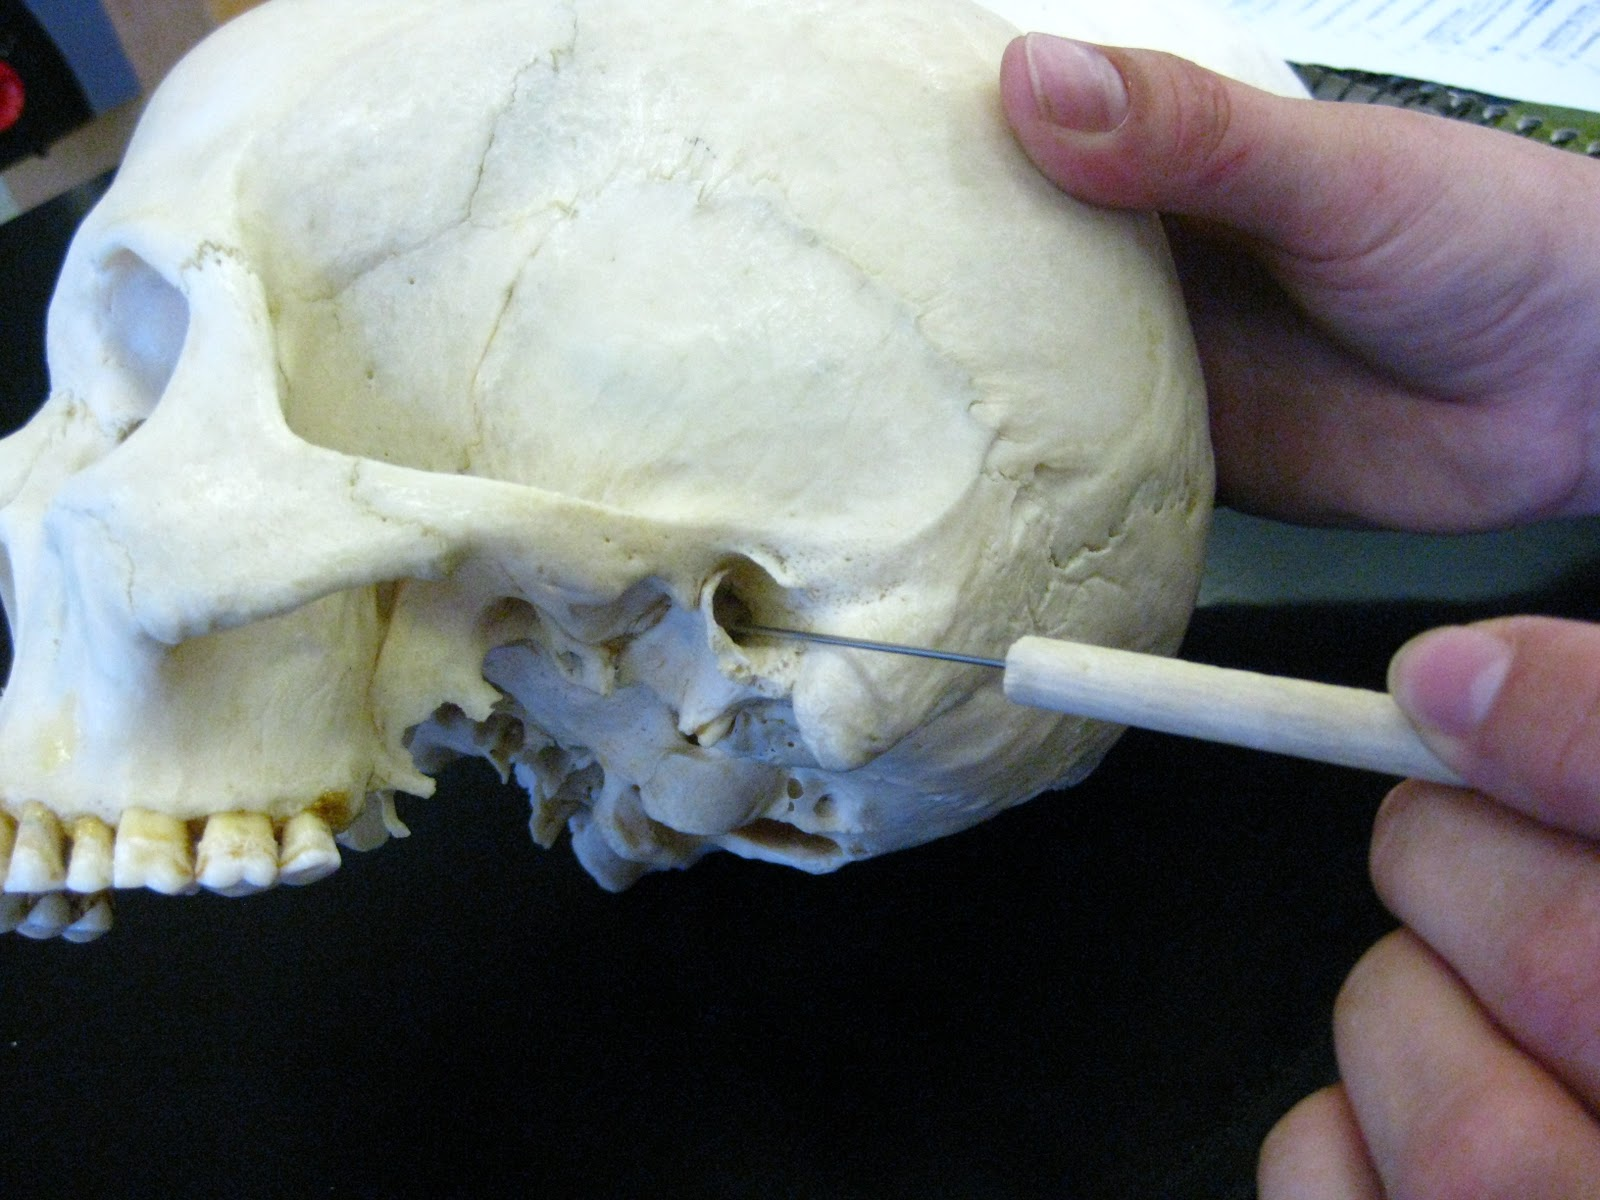 Boned: Human Skull - external auditory meatus (of temporal ...External Acoustic Meatus